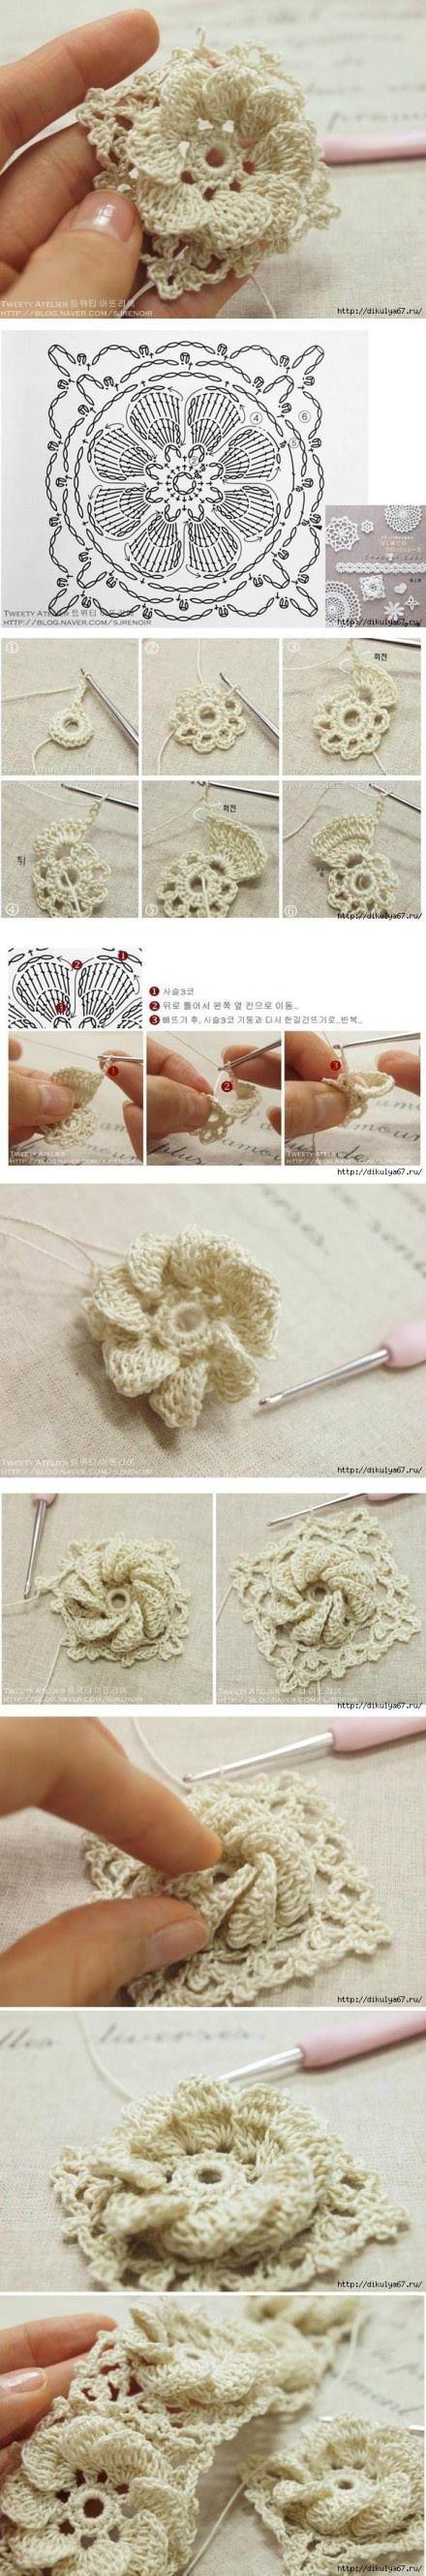 Crochet Flower motifs  Sent from my BlackBerry